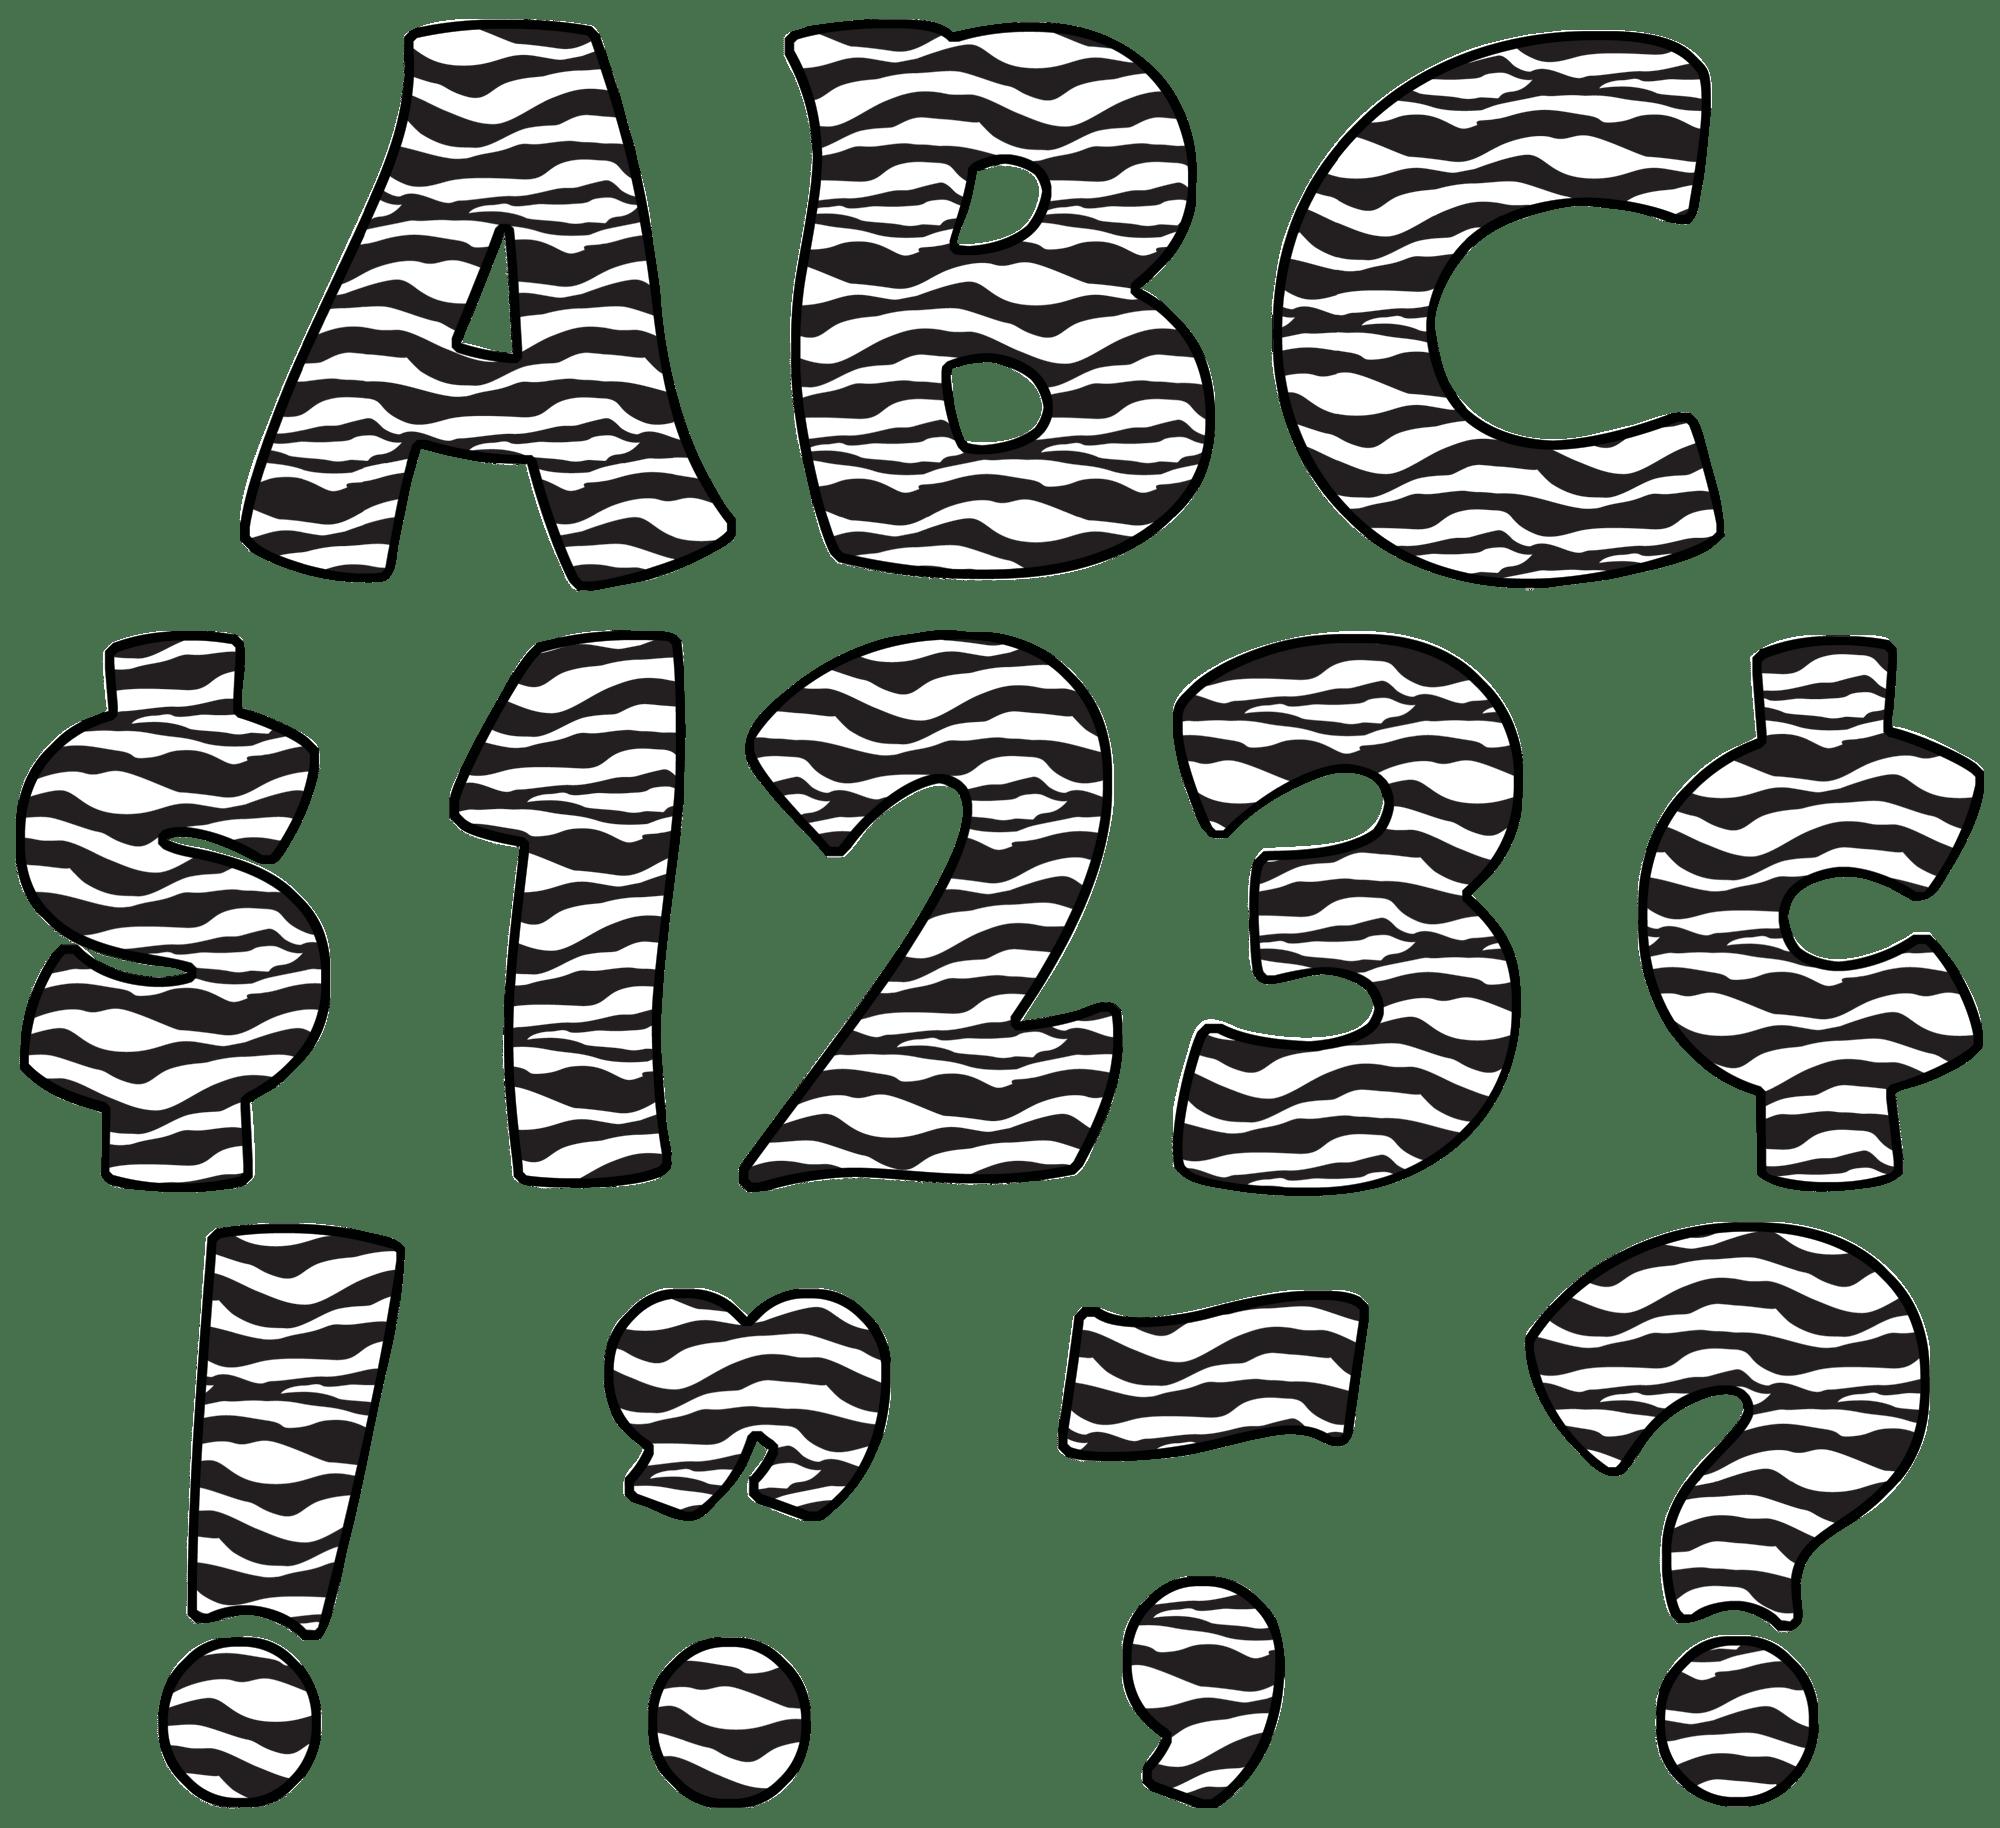 Zebra Print Funtastic 4 Letters Uppercase Pack